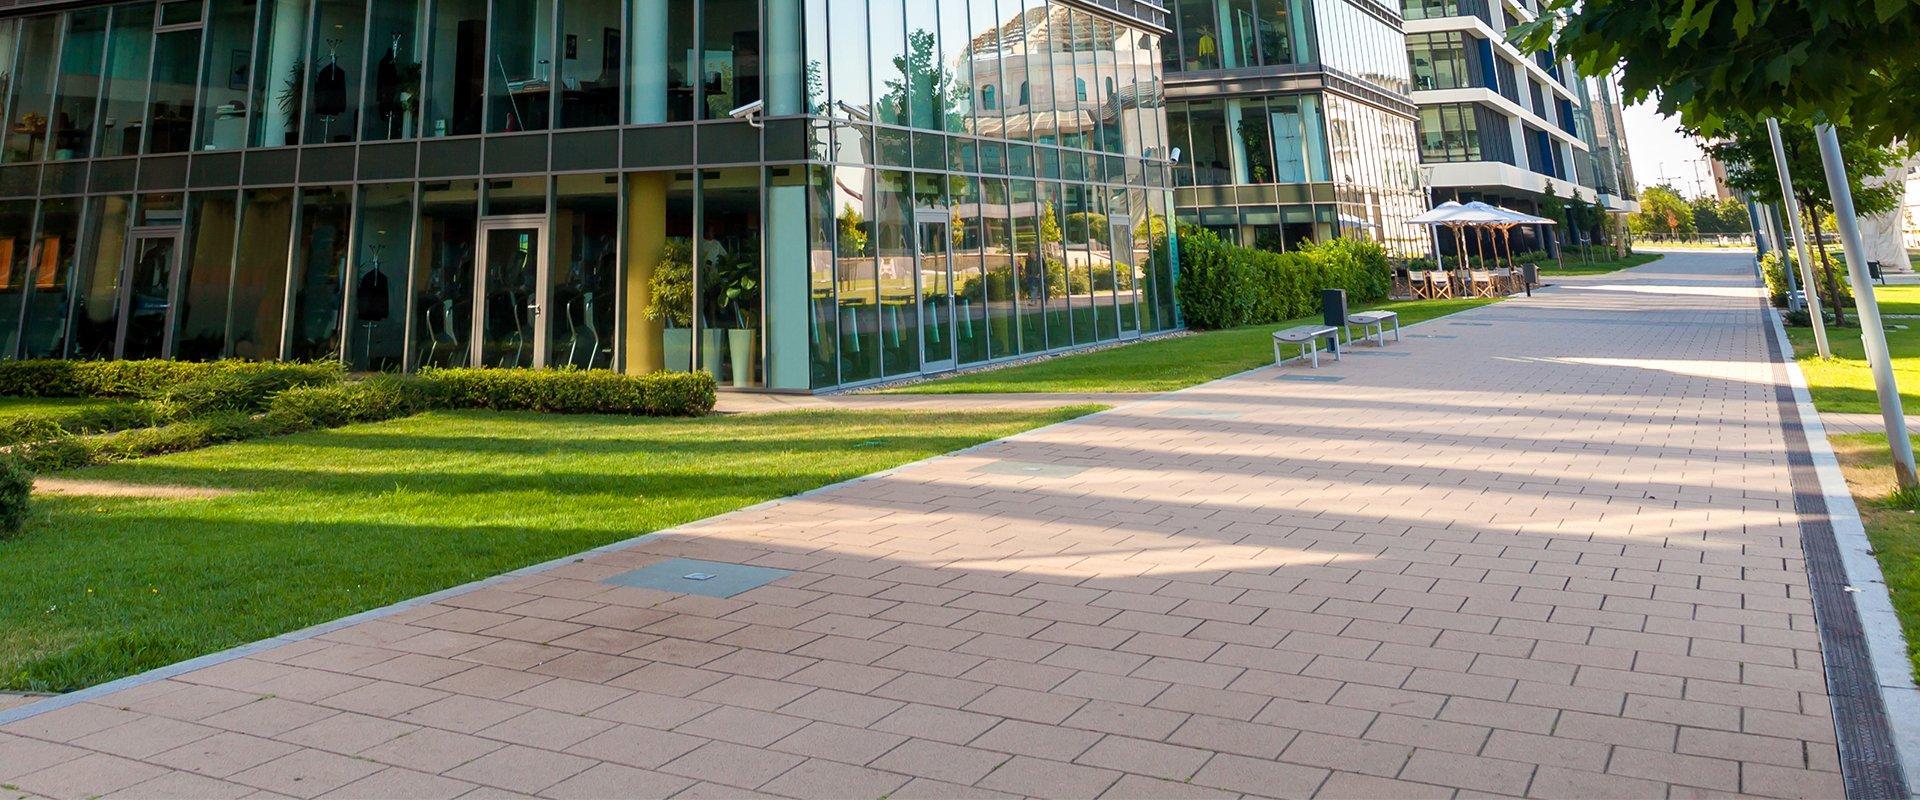 sidewalk near a commercial office building